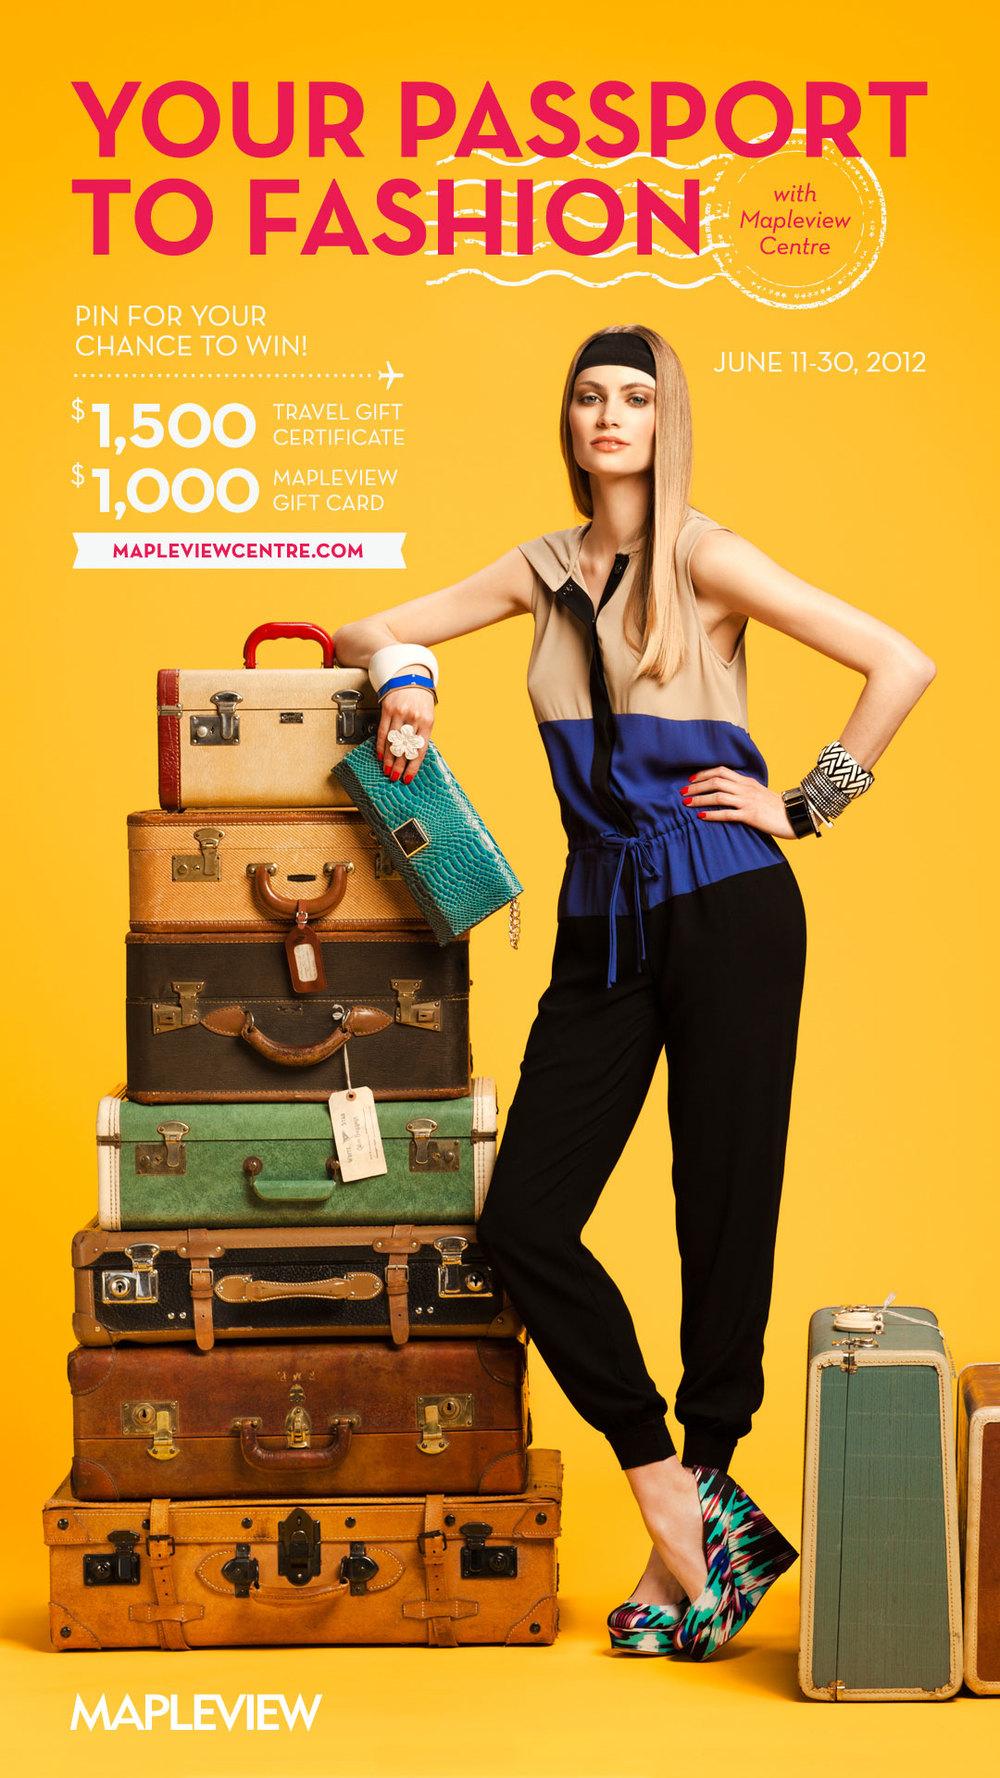 mapleview-marketing-vancouver-design-branding-9.jpg